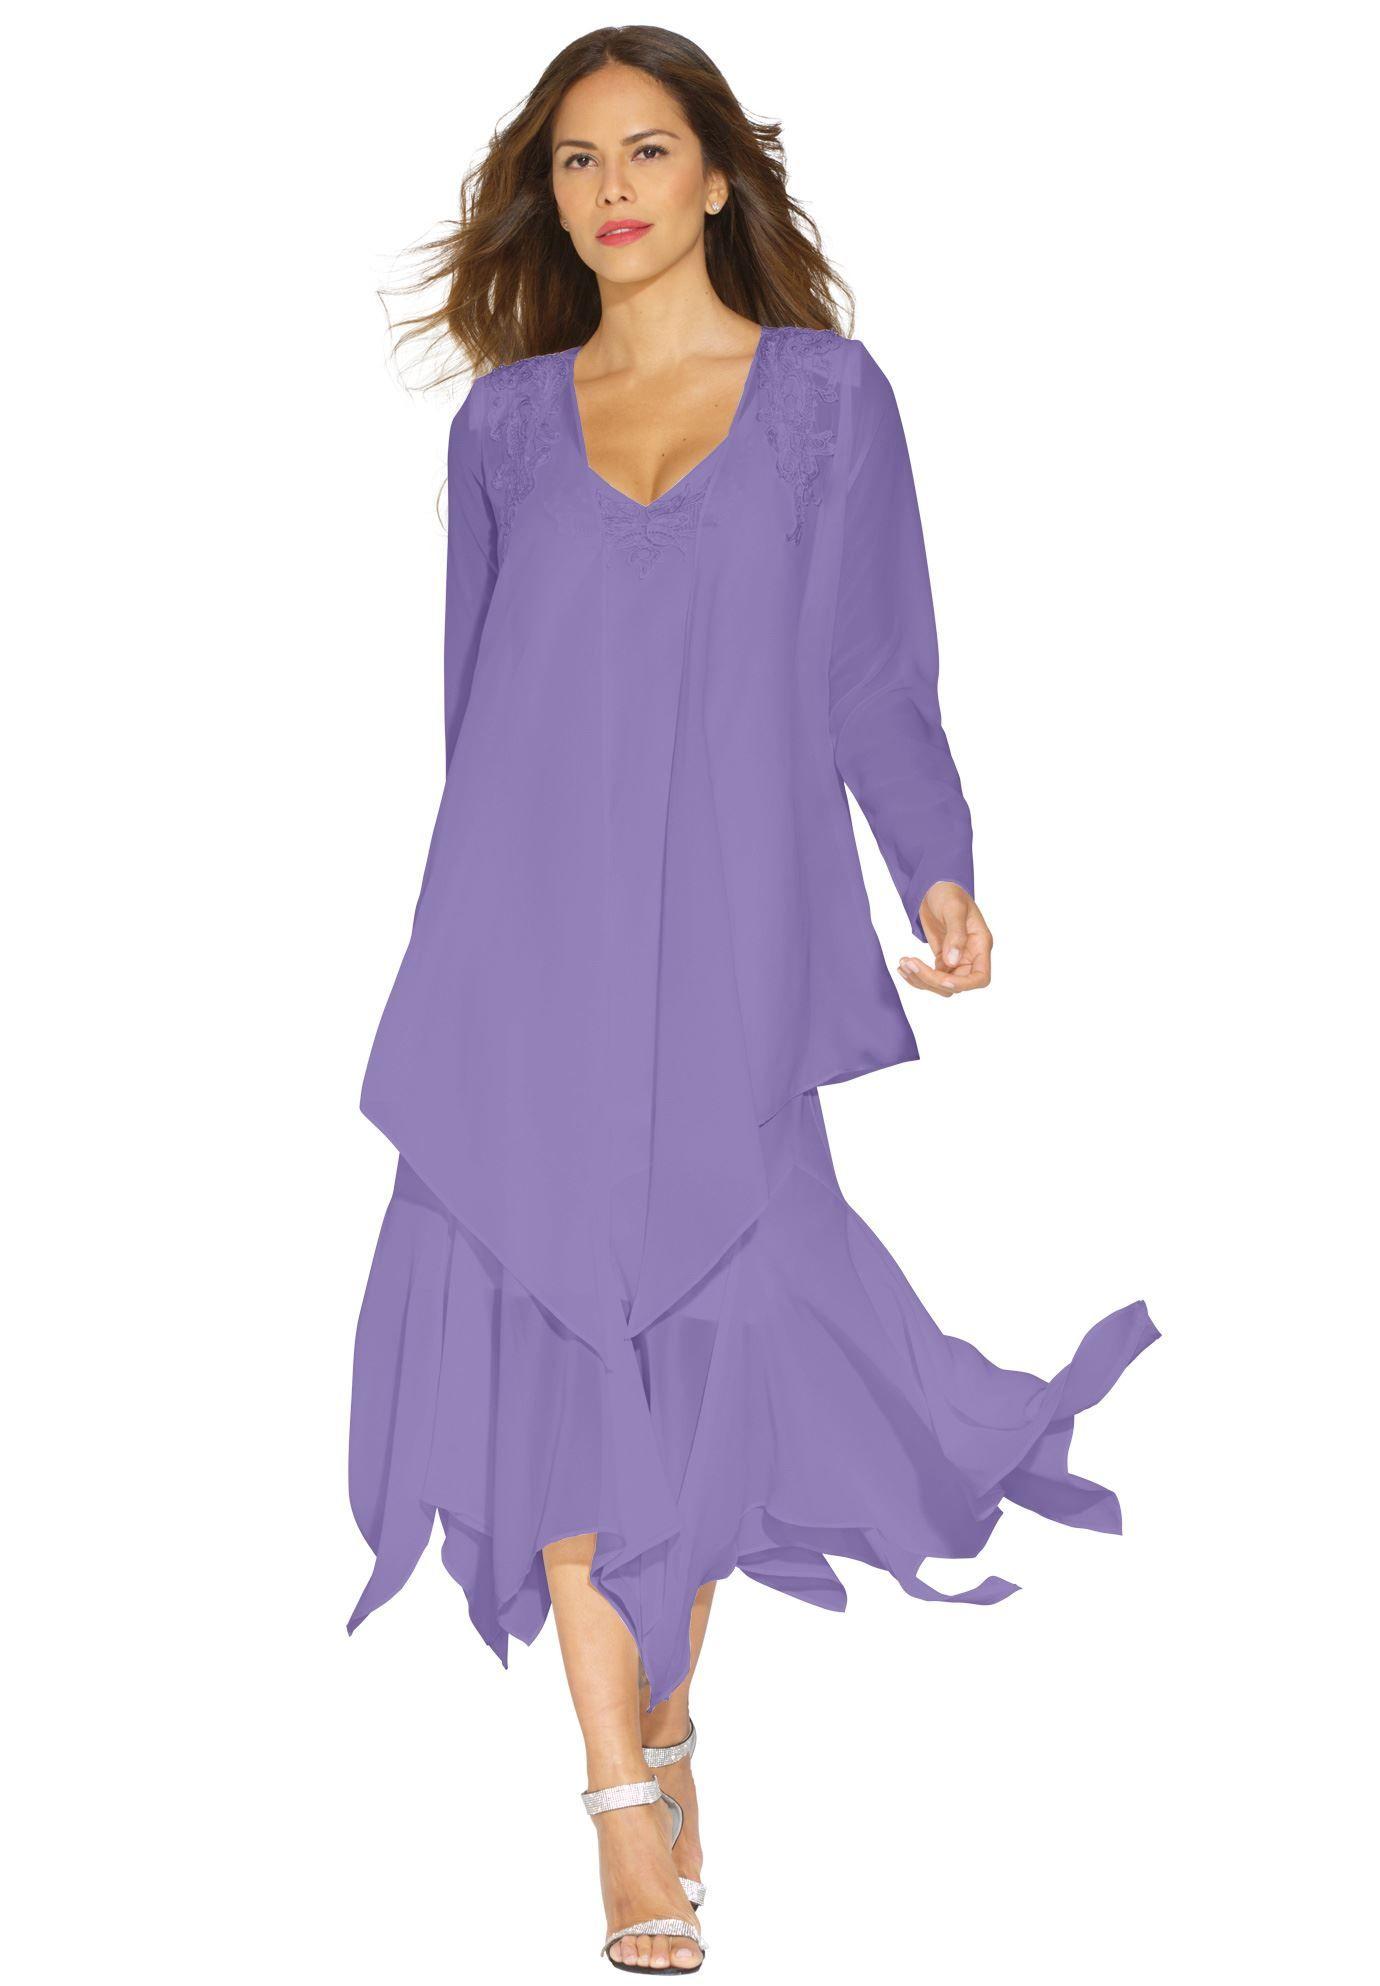 Roamans Plus Size Dresses For Weddings Dresses Dragon Blog